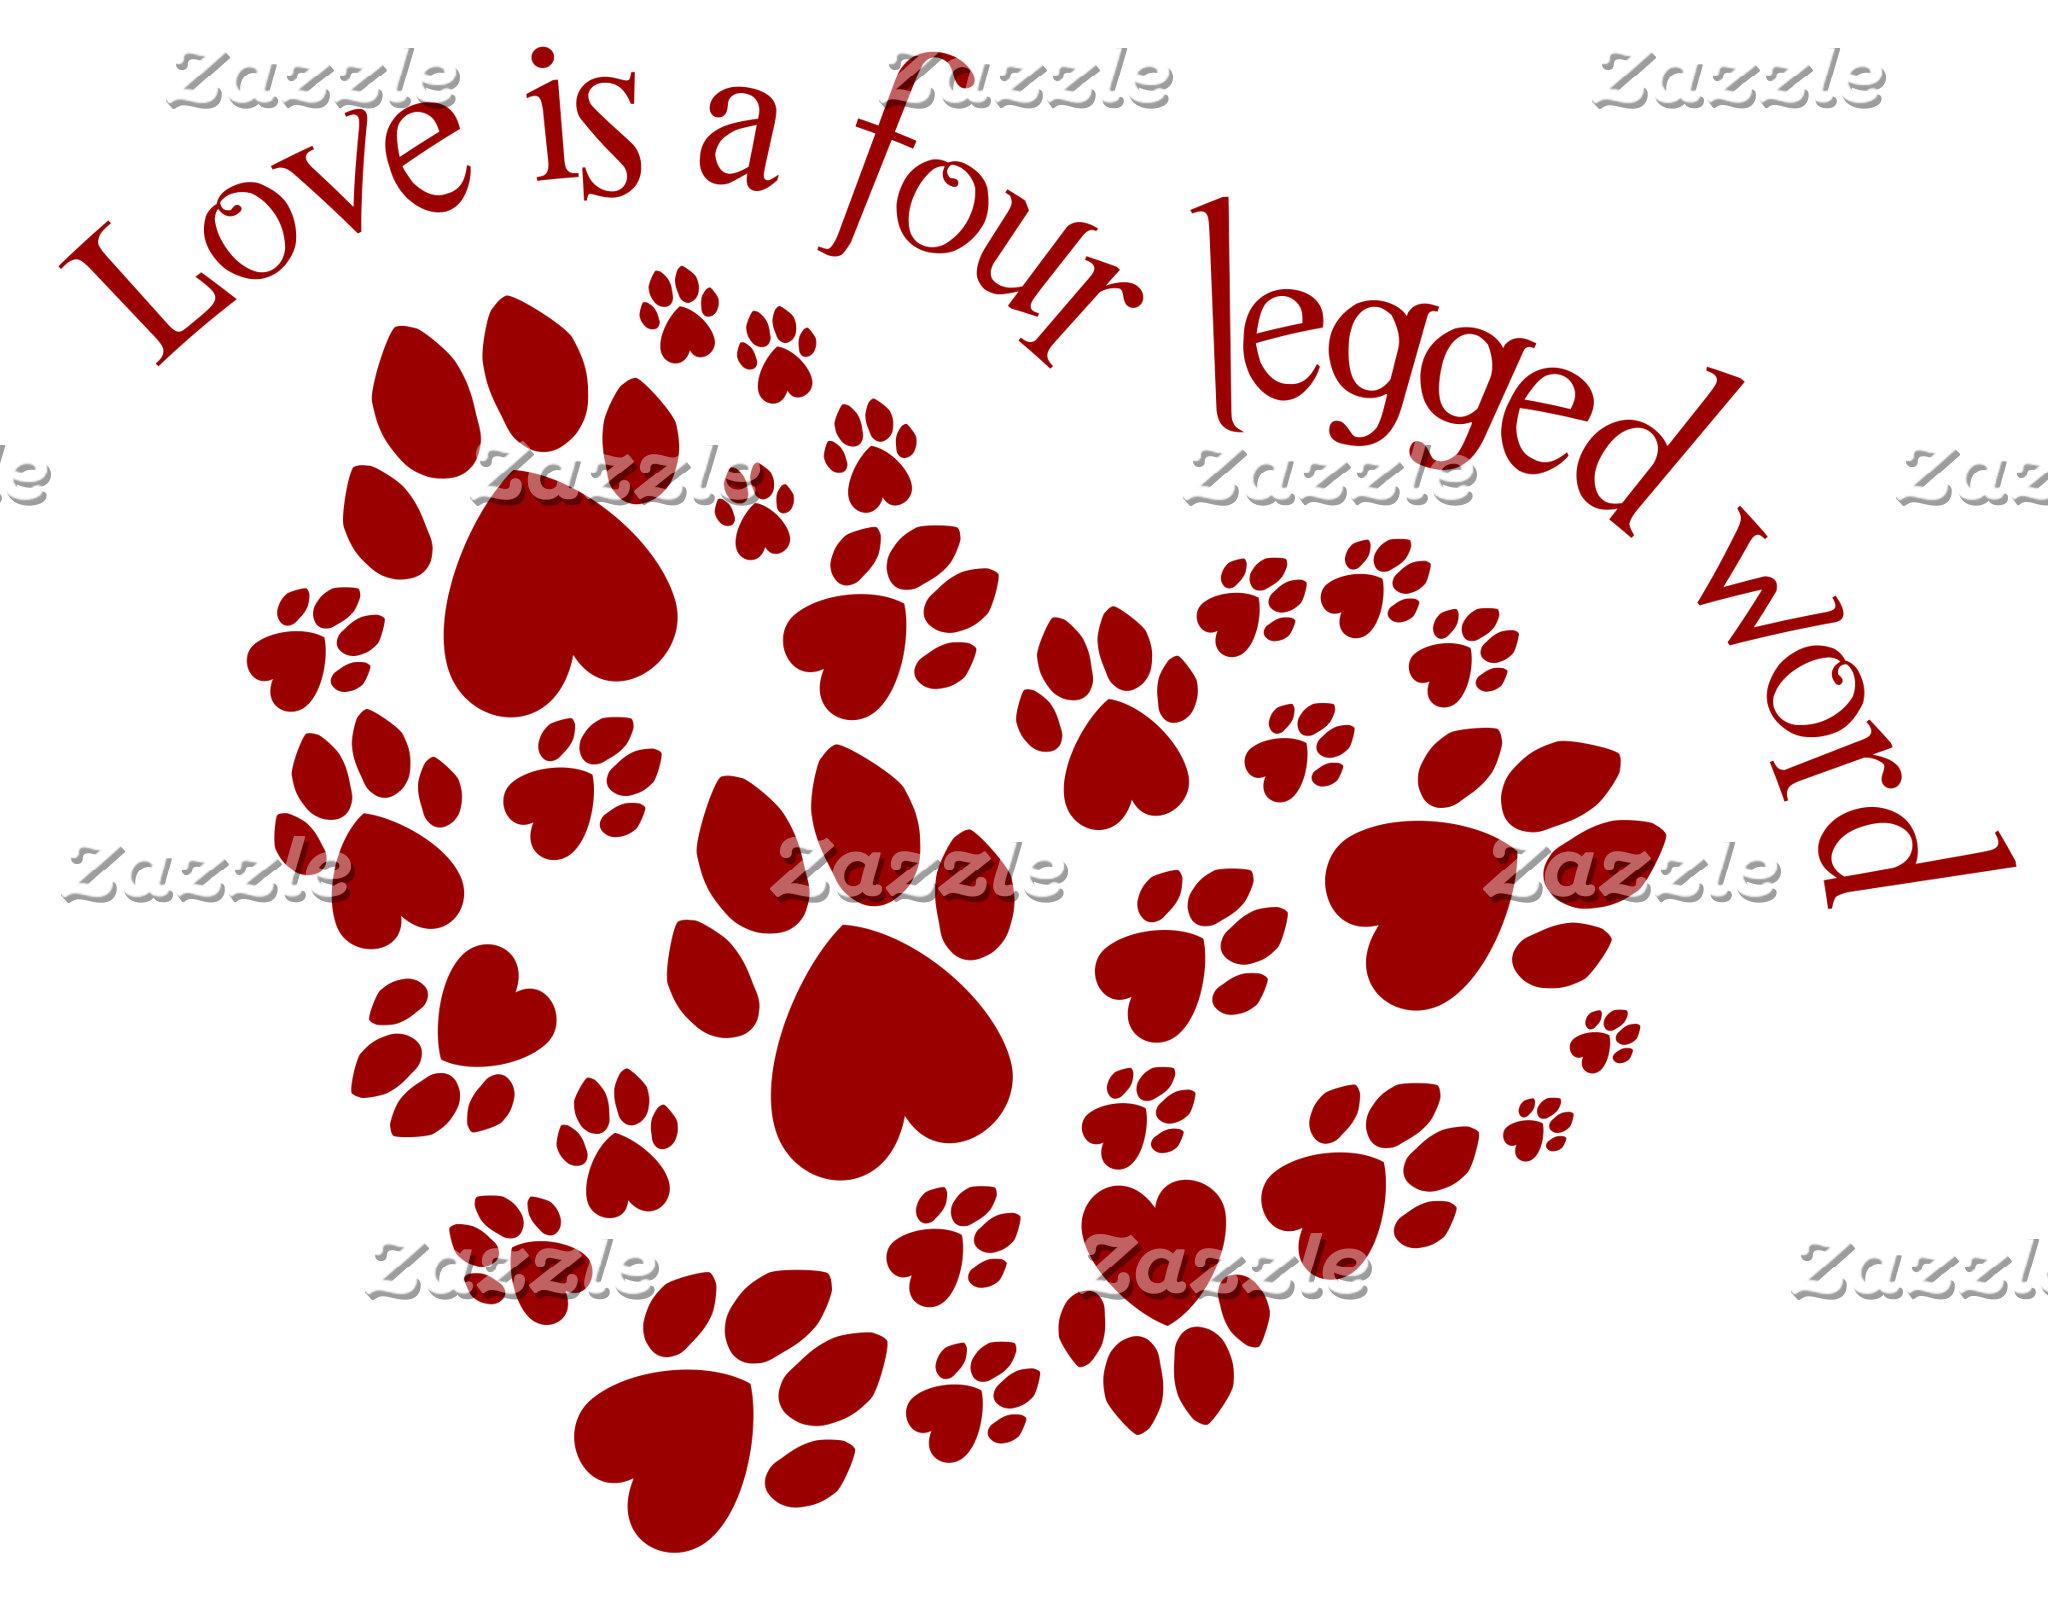 Love is 4 legged